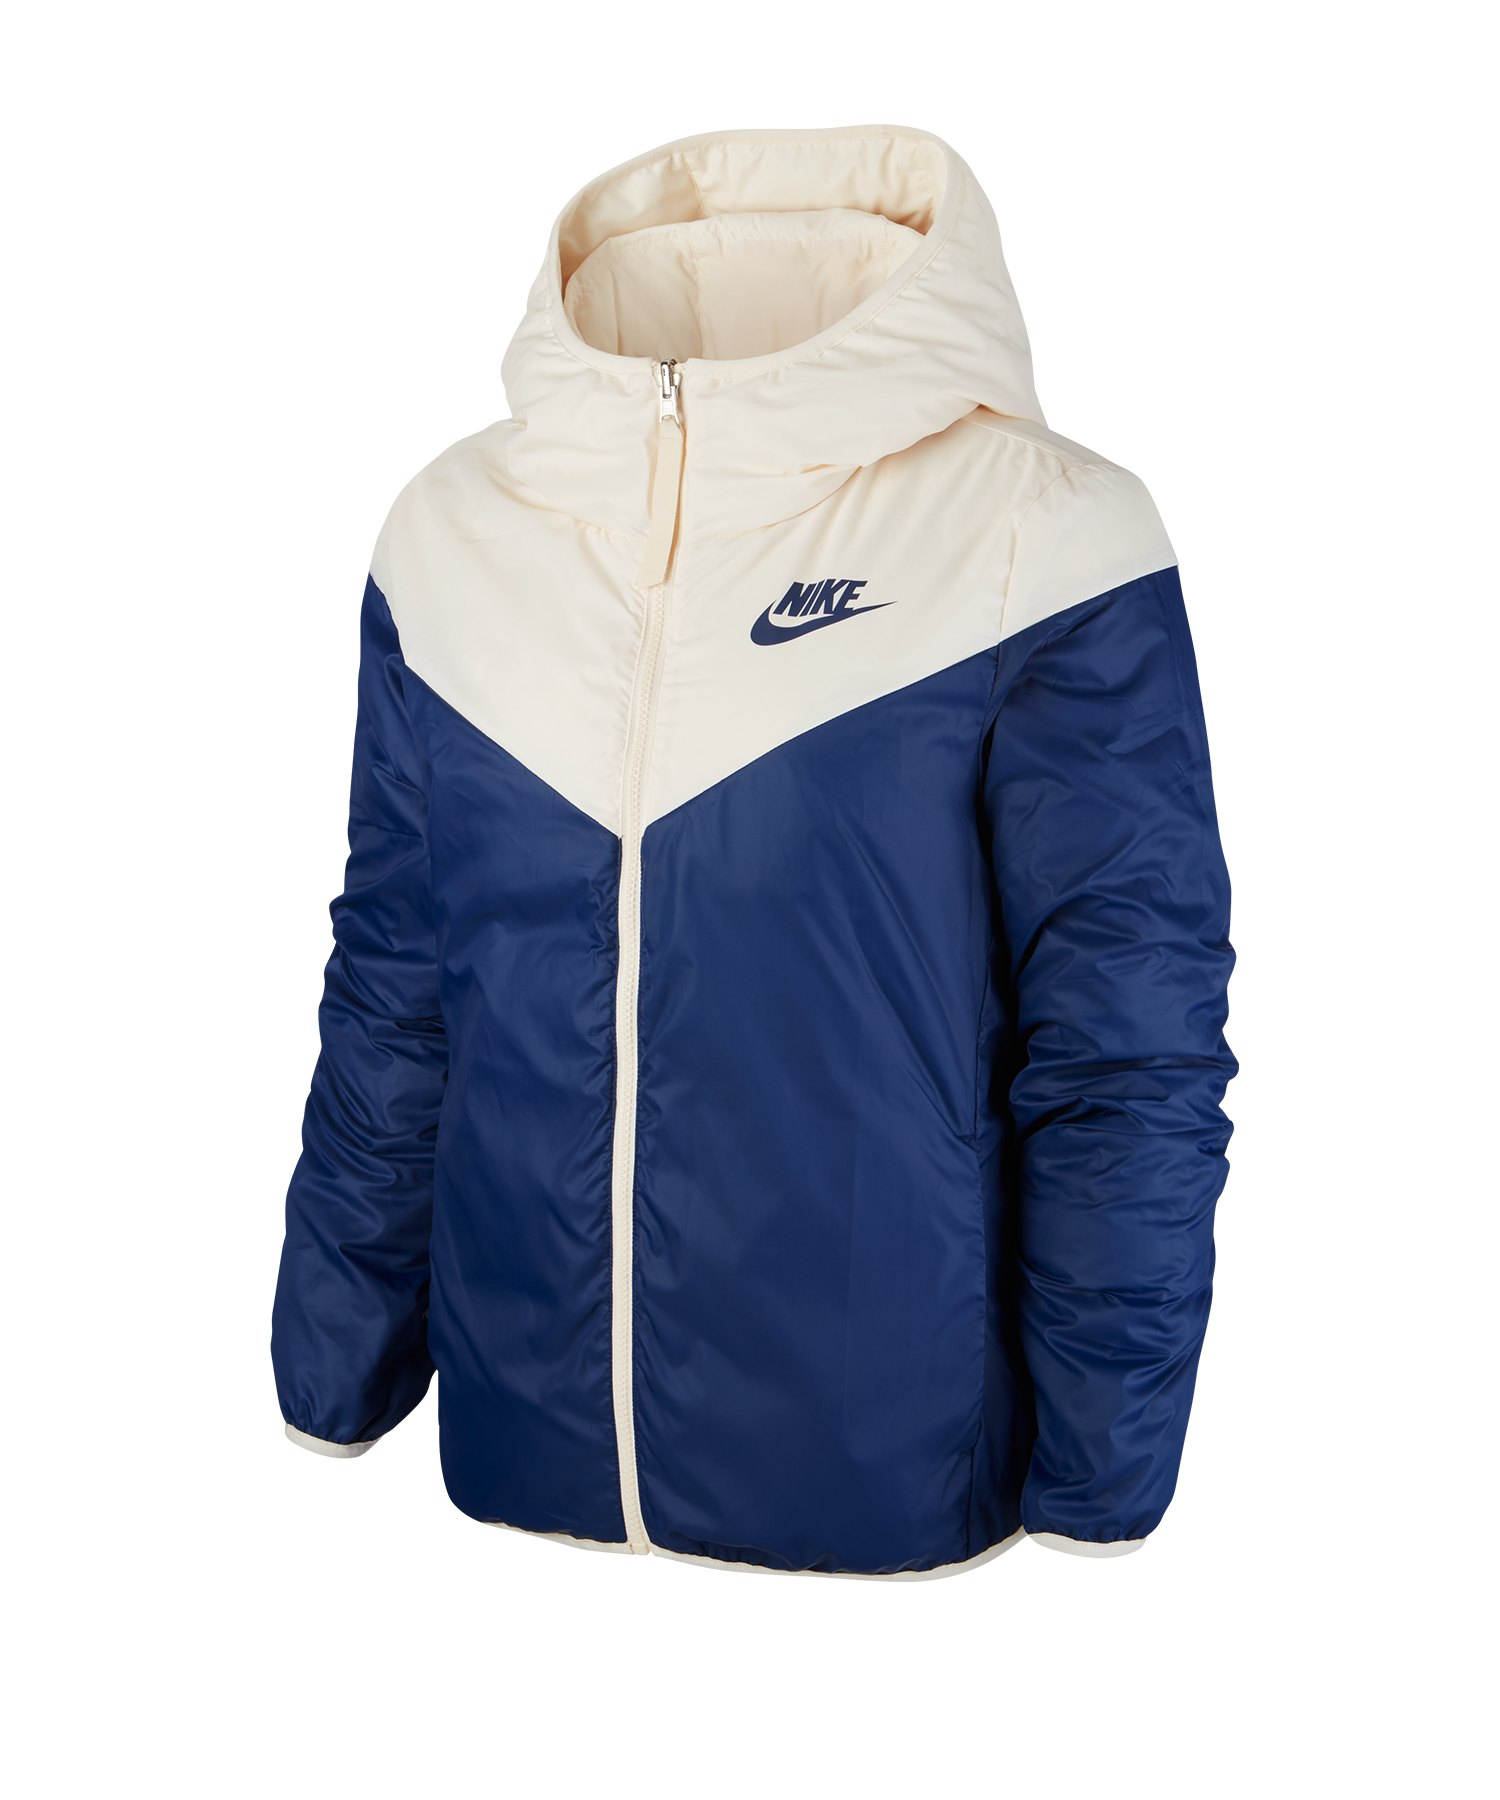 Nike Jacke Herren CR7 Gr. M Wendejacke Schwarz